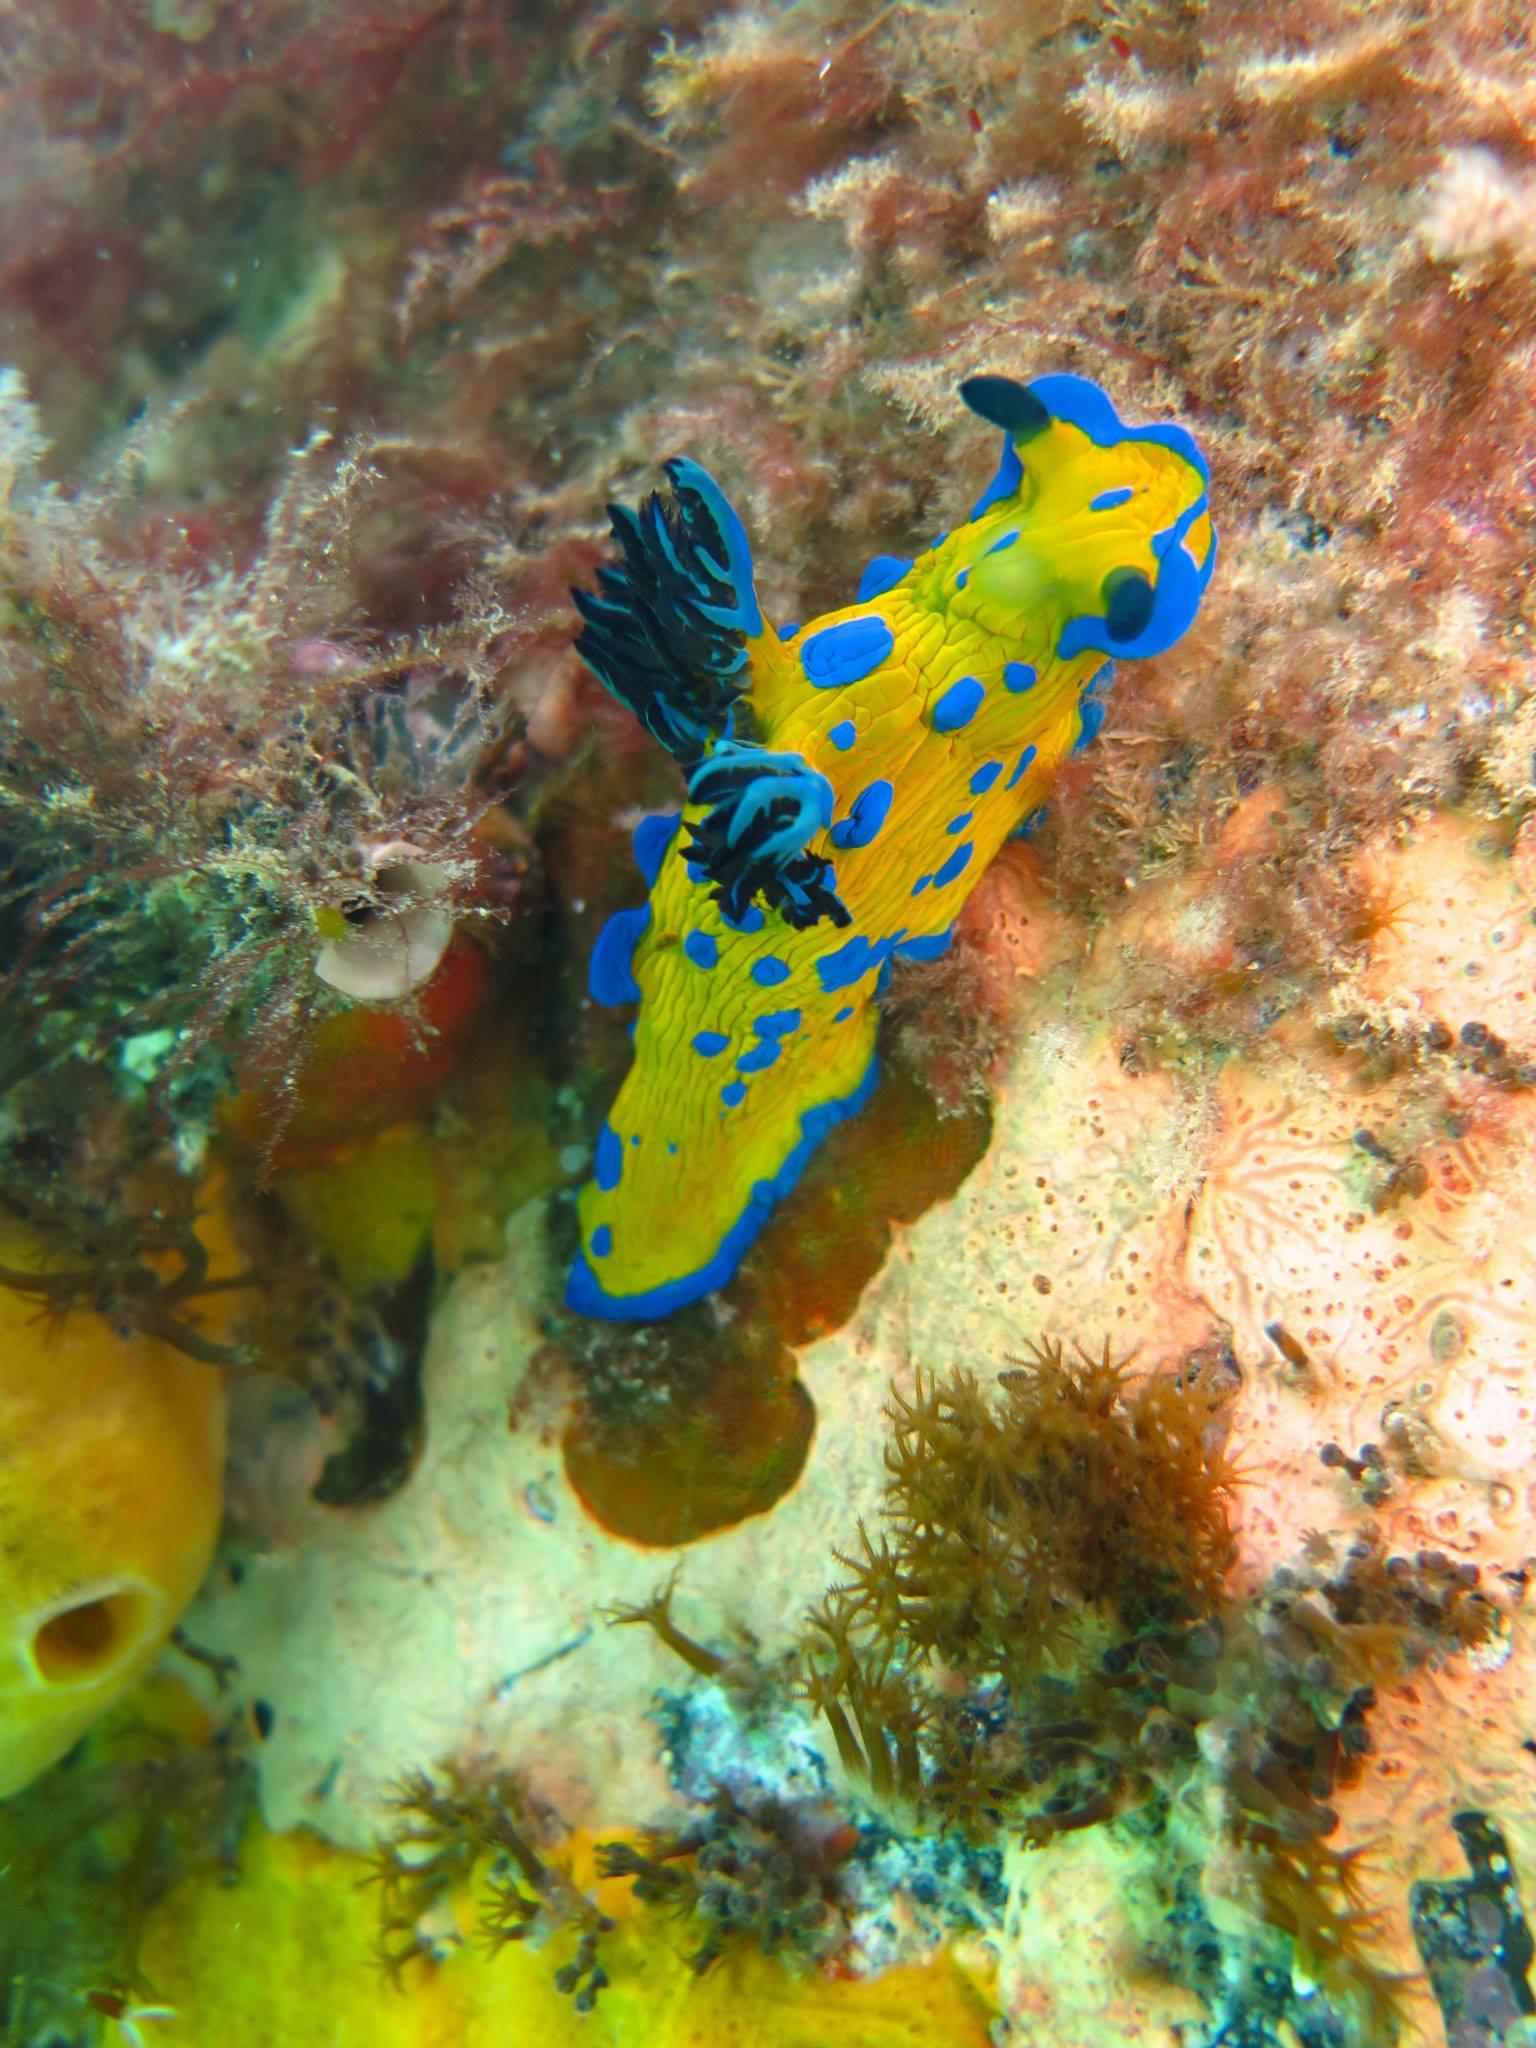 Verco's nudibranch. Image: Cathy Cavallo